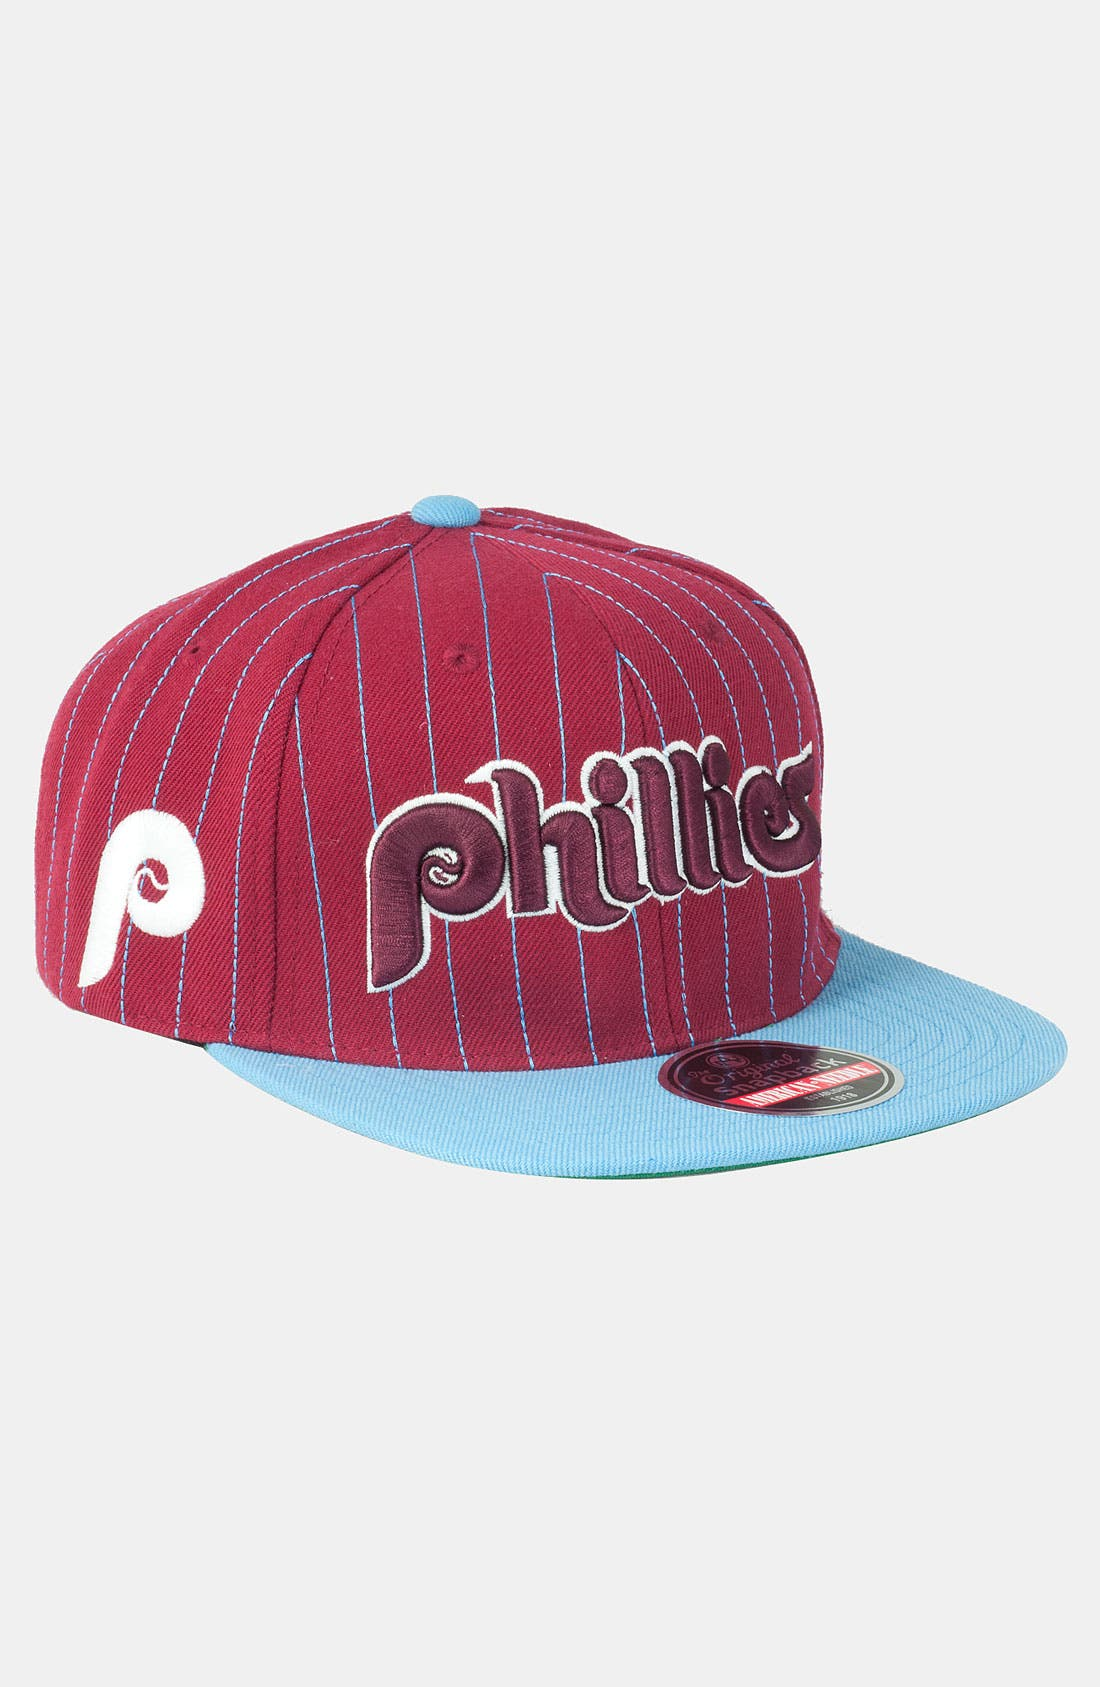 Alternate Image 1 Selected - American Needle 'Phillies' Snapback Baseball Cap